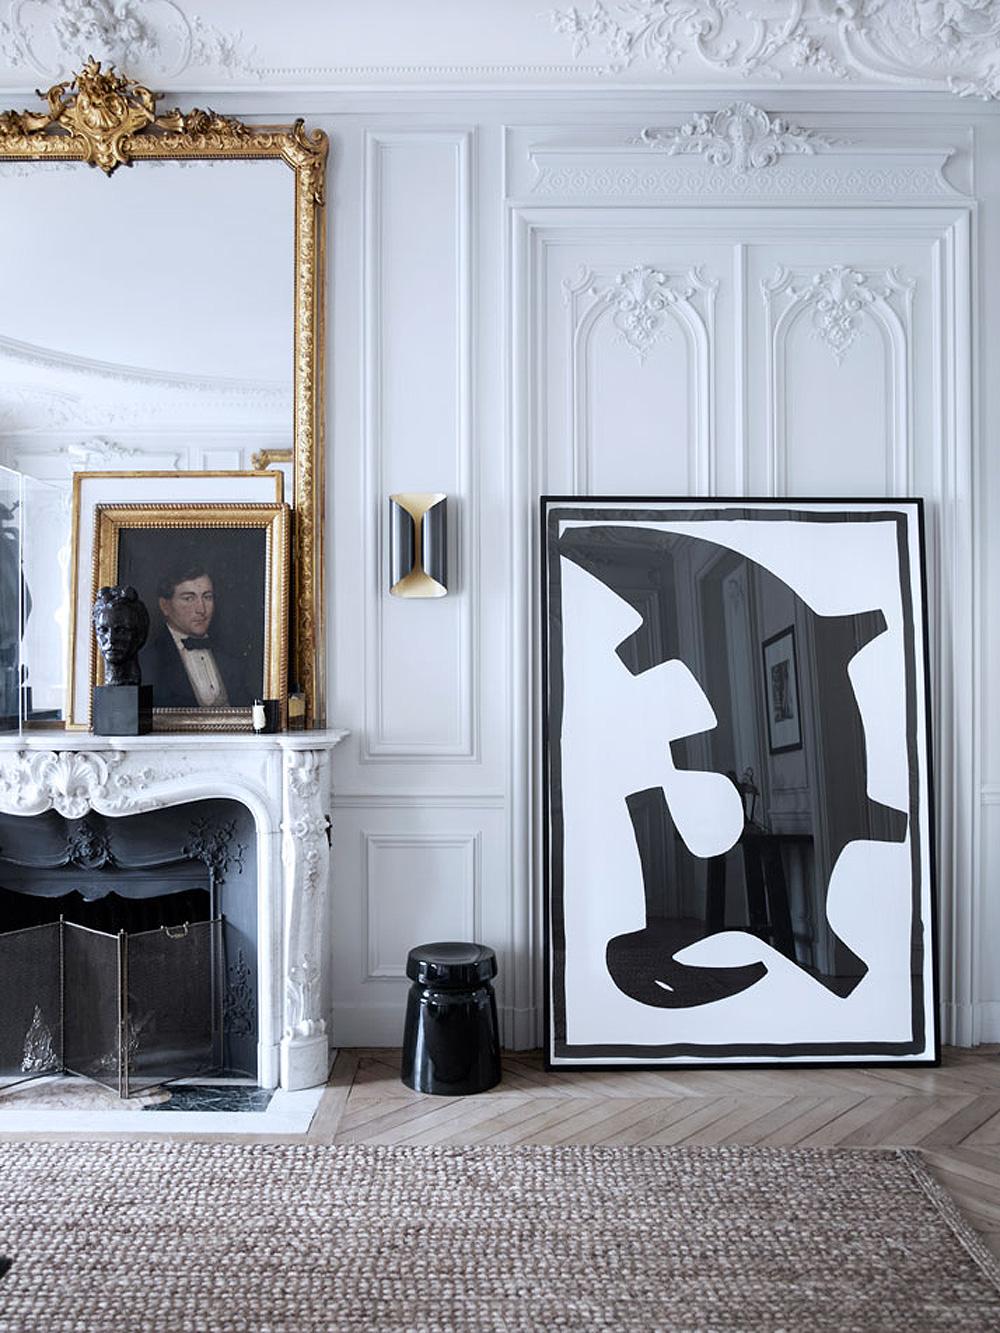 Photos by Birgitta Wolfgang Drejer / Sister Agency via Yatzer